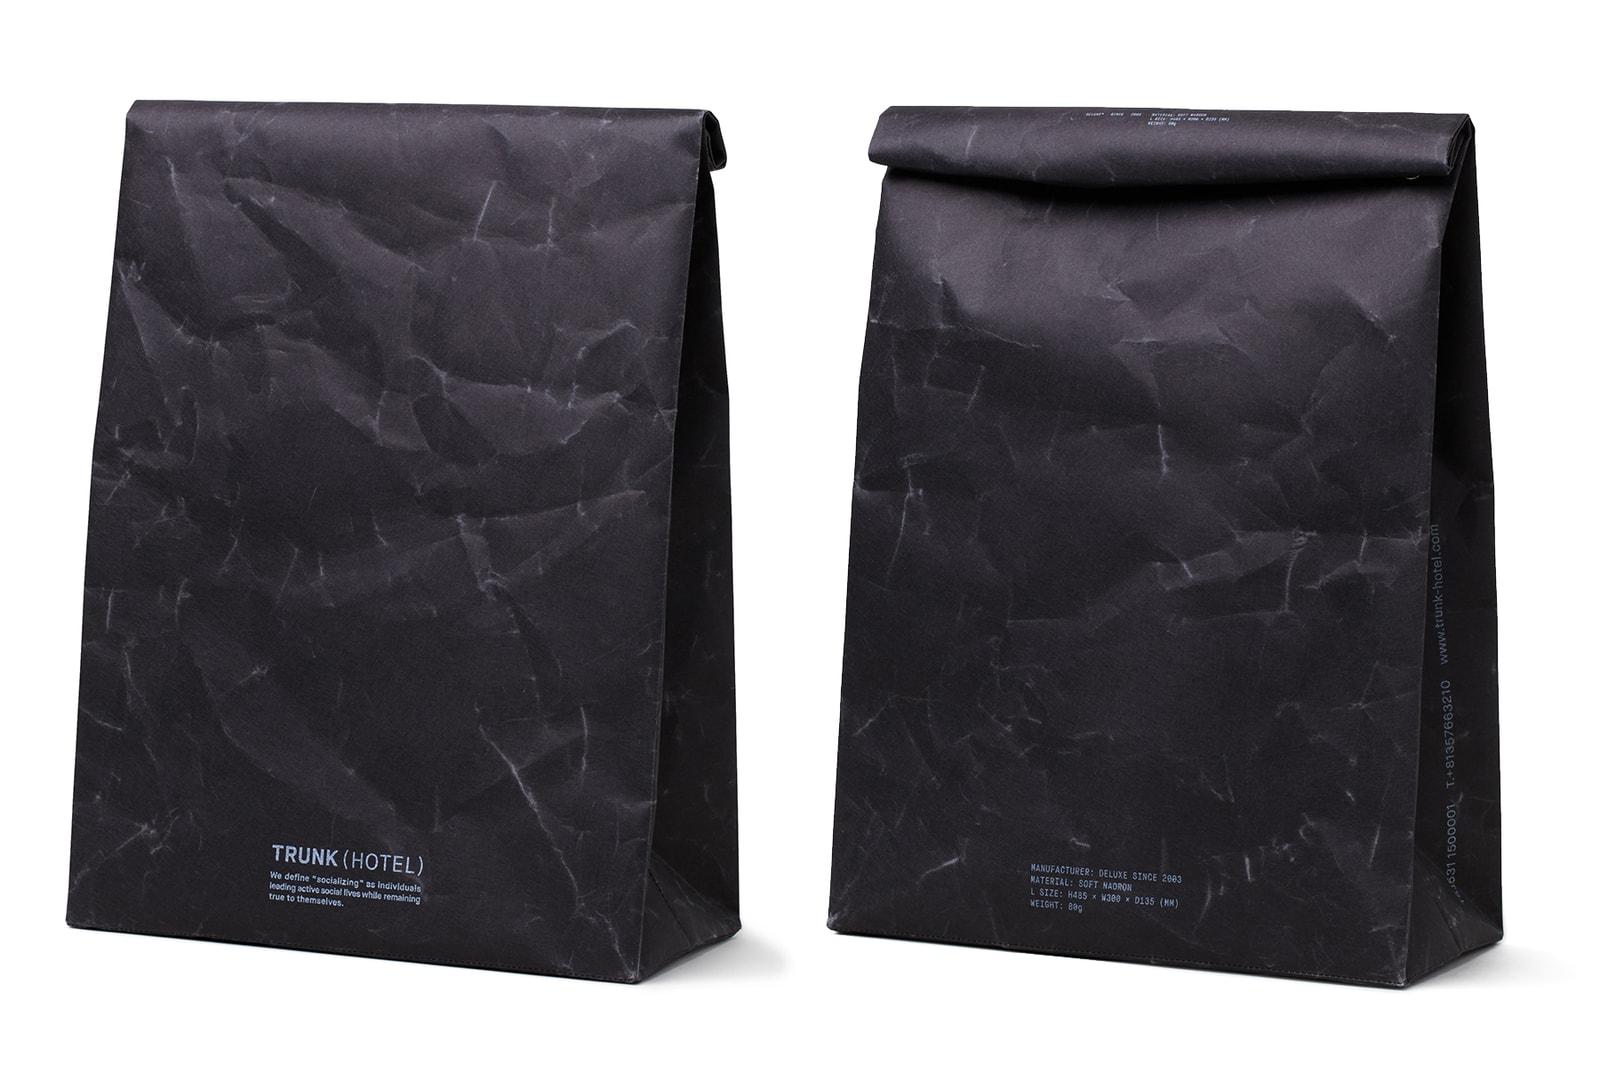 SIWA by DELUXE x TRUNK(HOTEL) 紙和 デラックス トランクホテル スーベニアバッグ 紙袋 バッグ コラボ